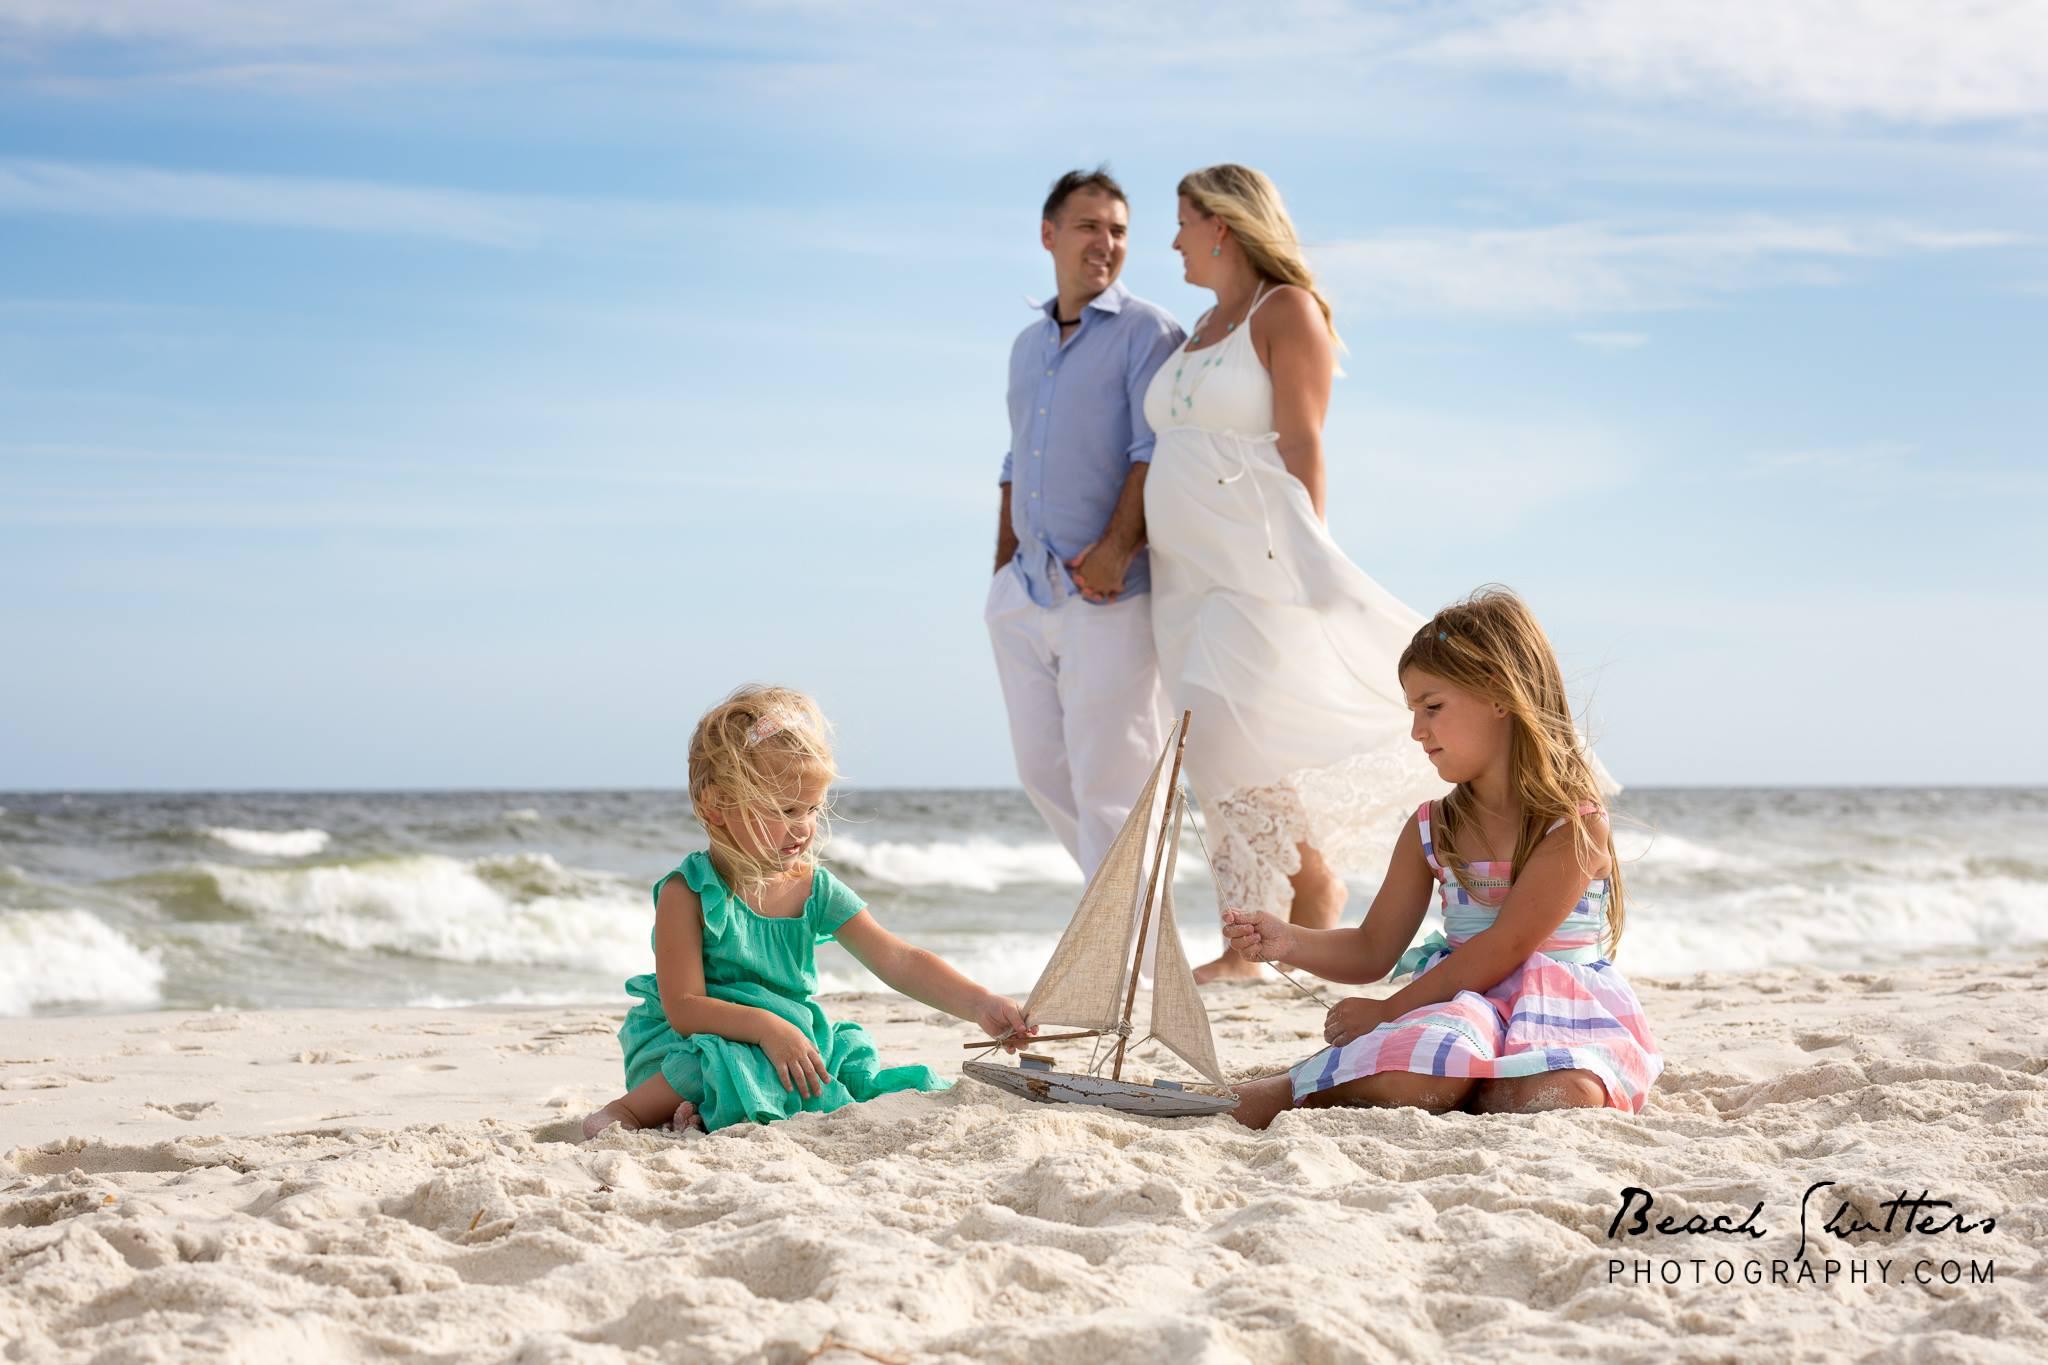 Spring Break Photo Session family beach portrait photographer in Orange Beach Alabama